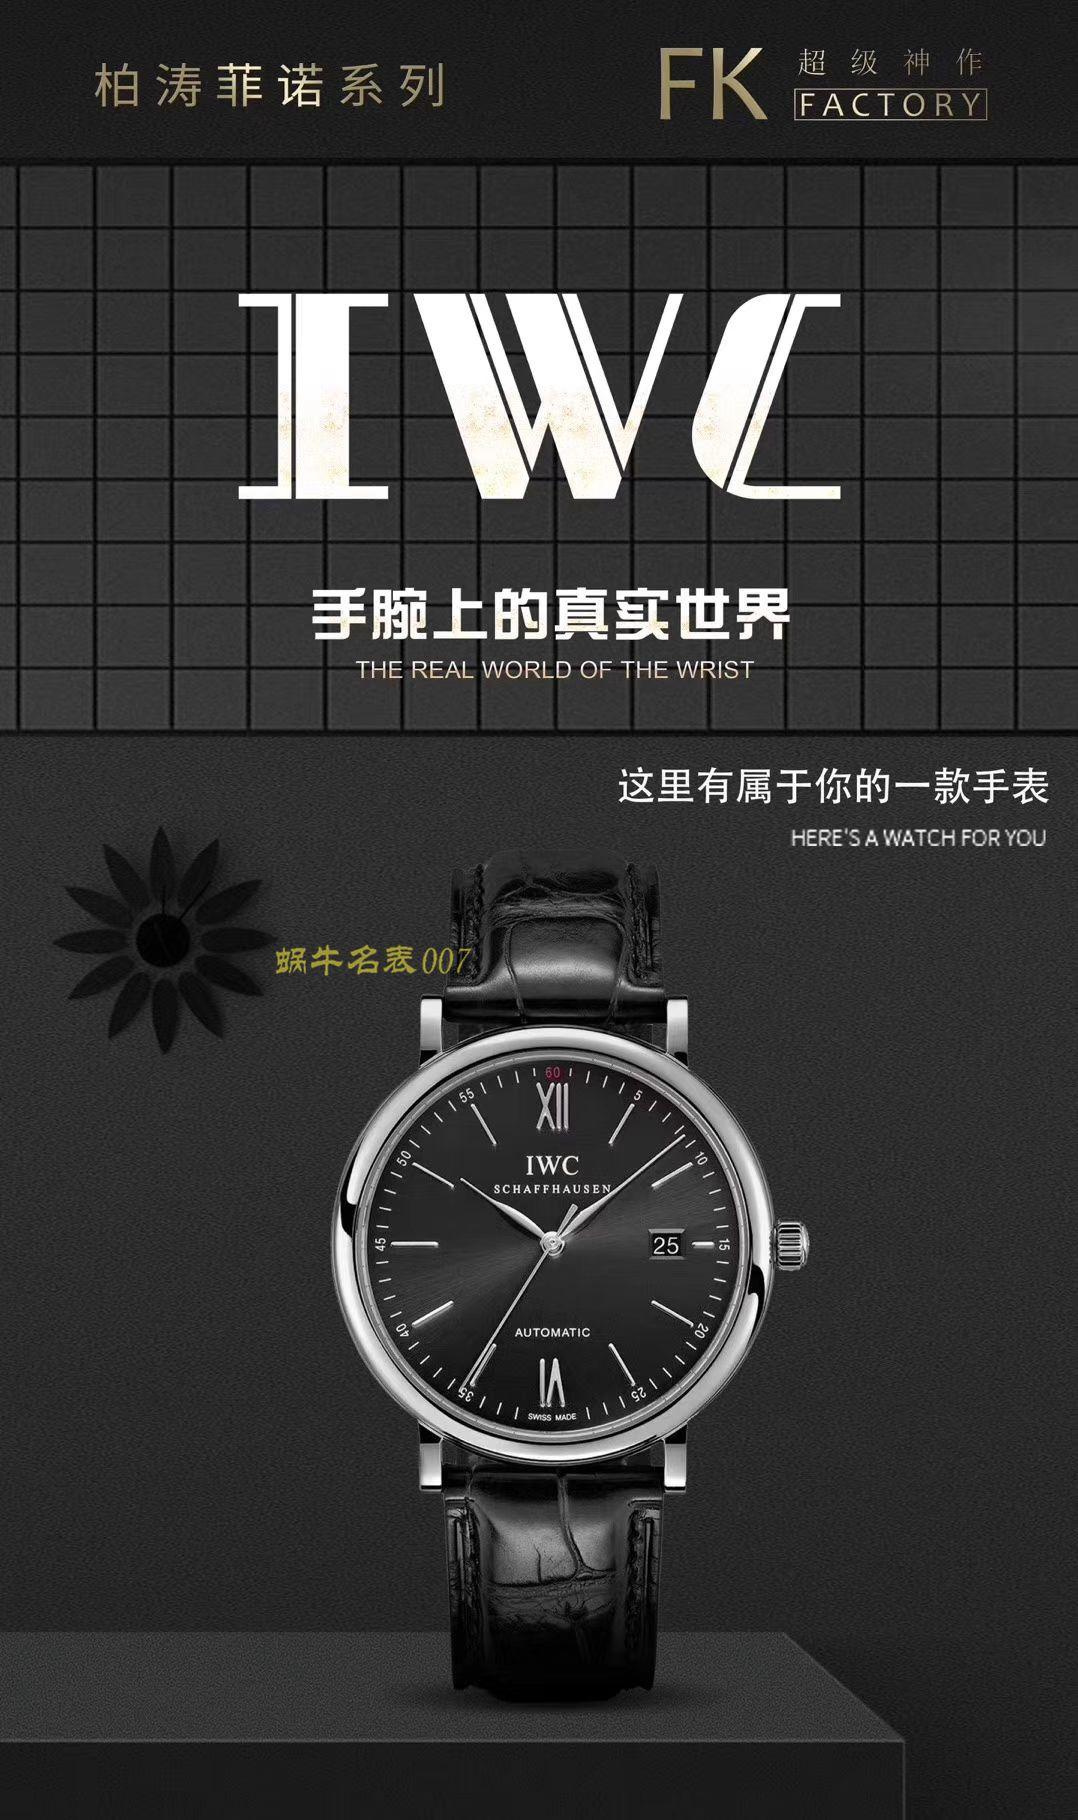 万国表柏涛菲诺系列IW356501、IW356304、IW356505、IW356511、IW356517、W356512腕表【FK厂一比一高仿复制】 / WG178